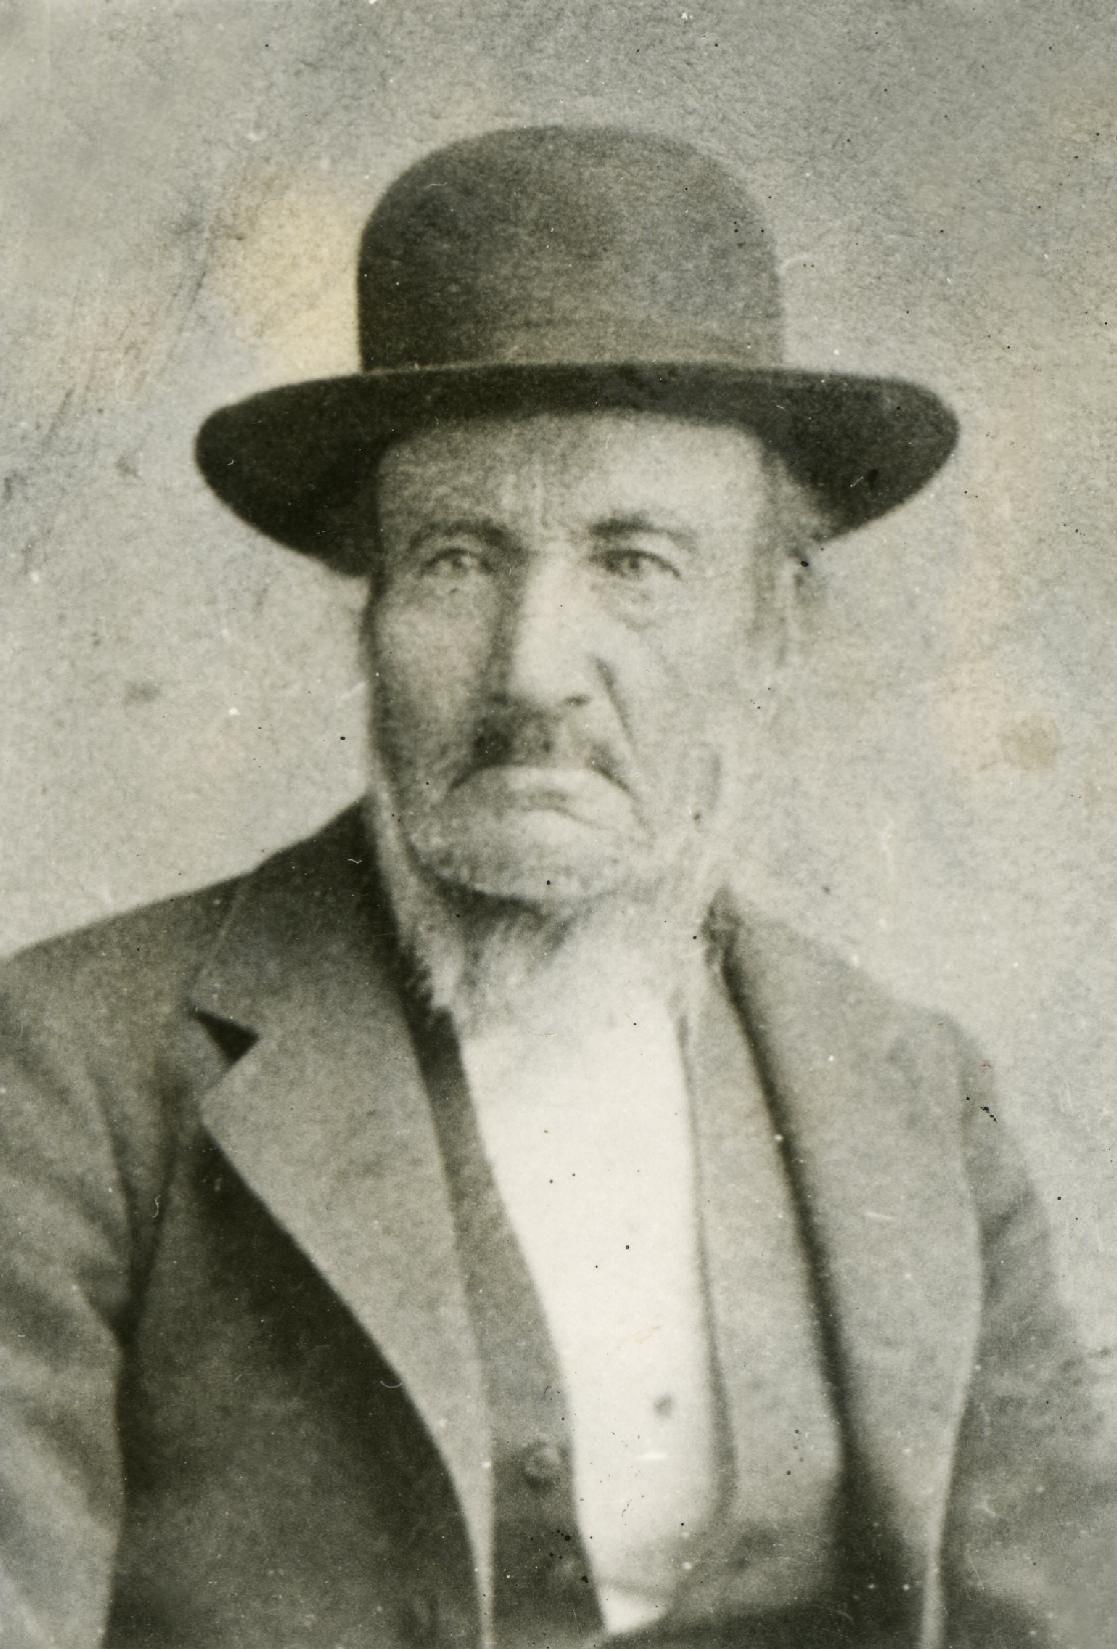 Carter, William Furlsbury